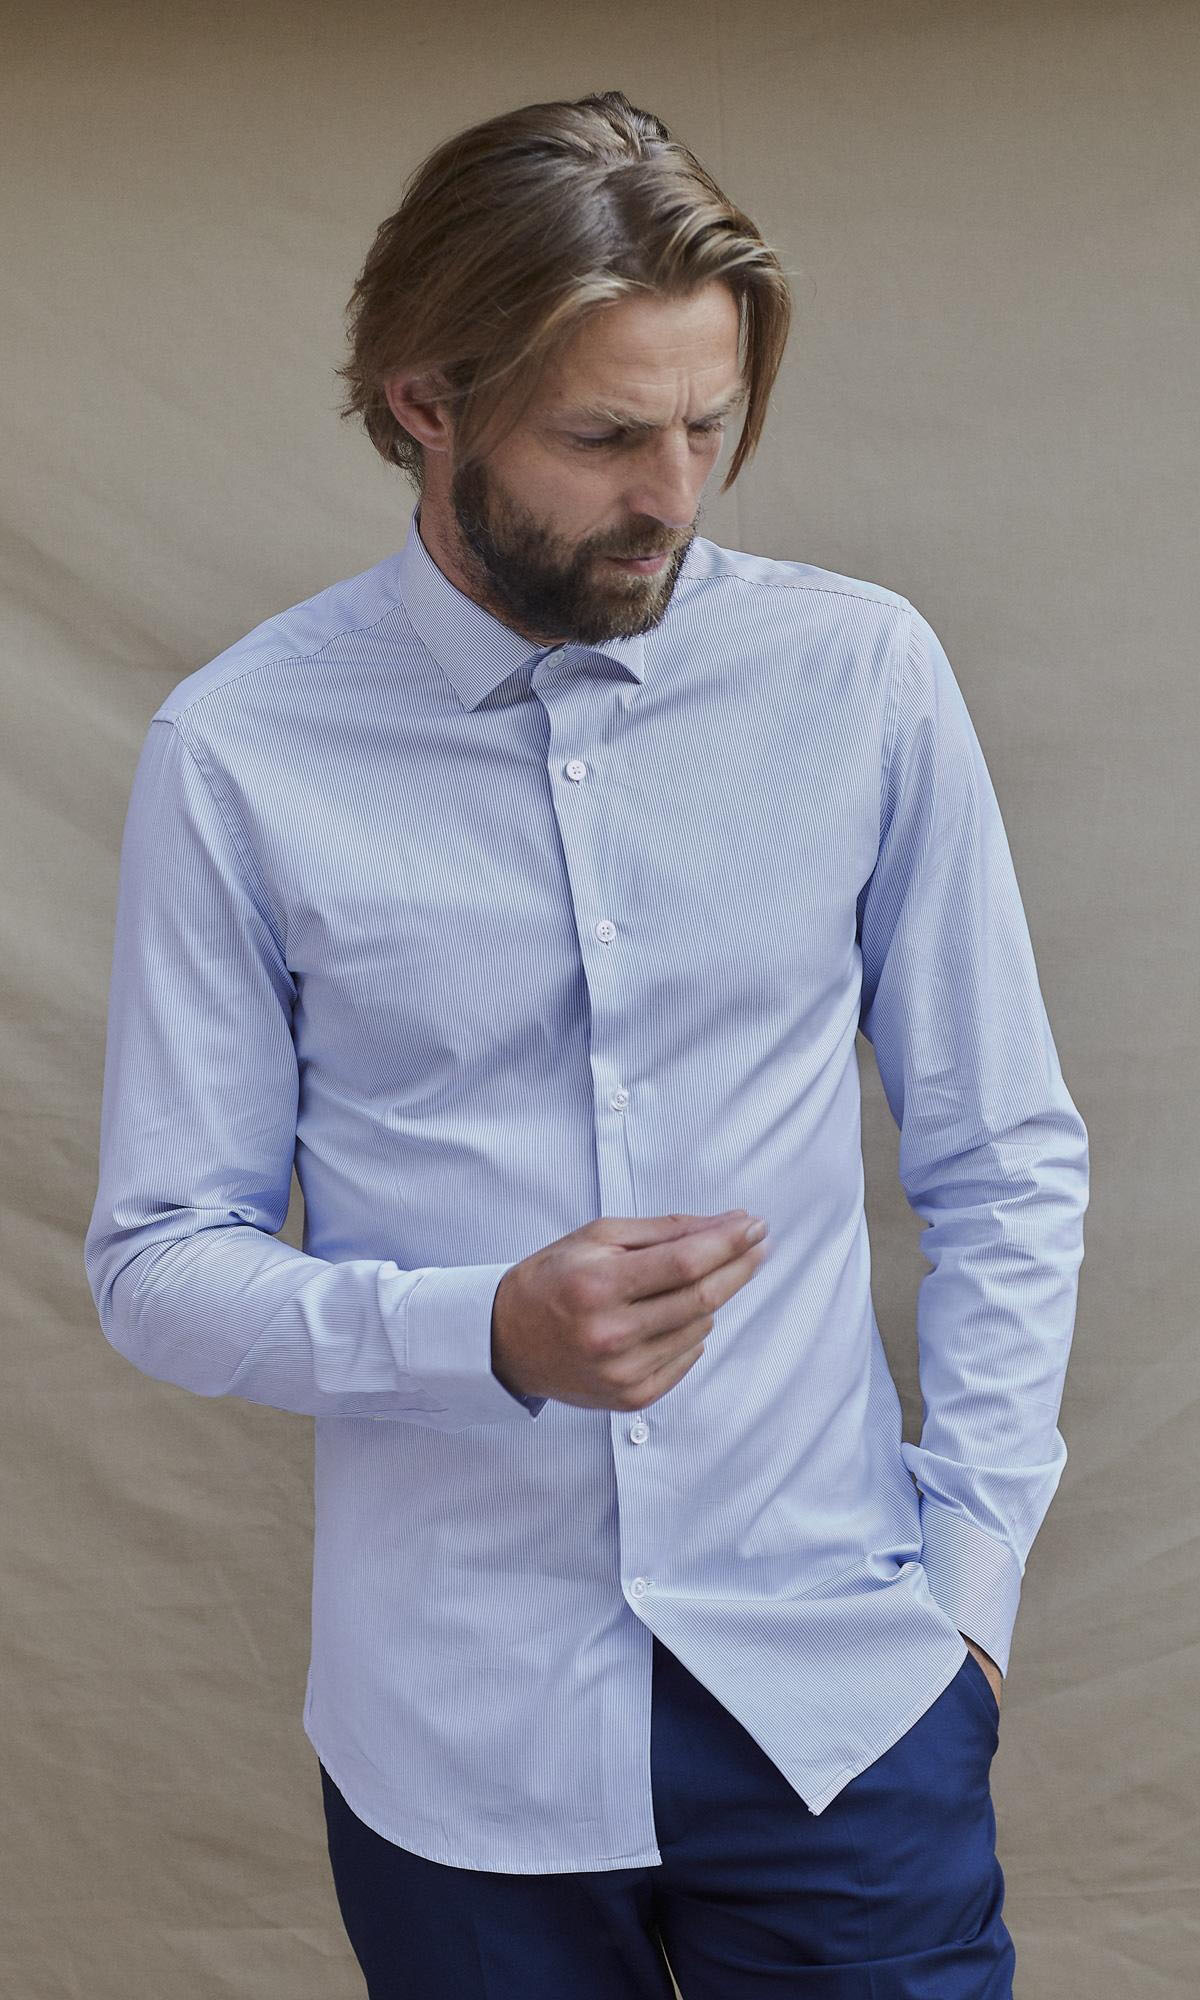 Chemise raies bleues Les chemises